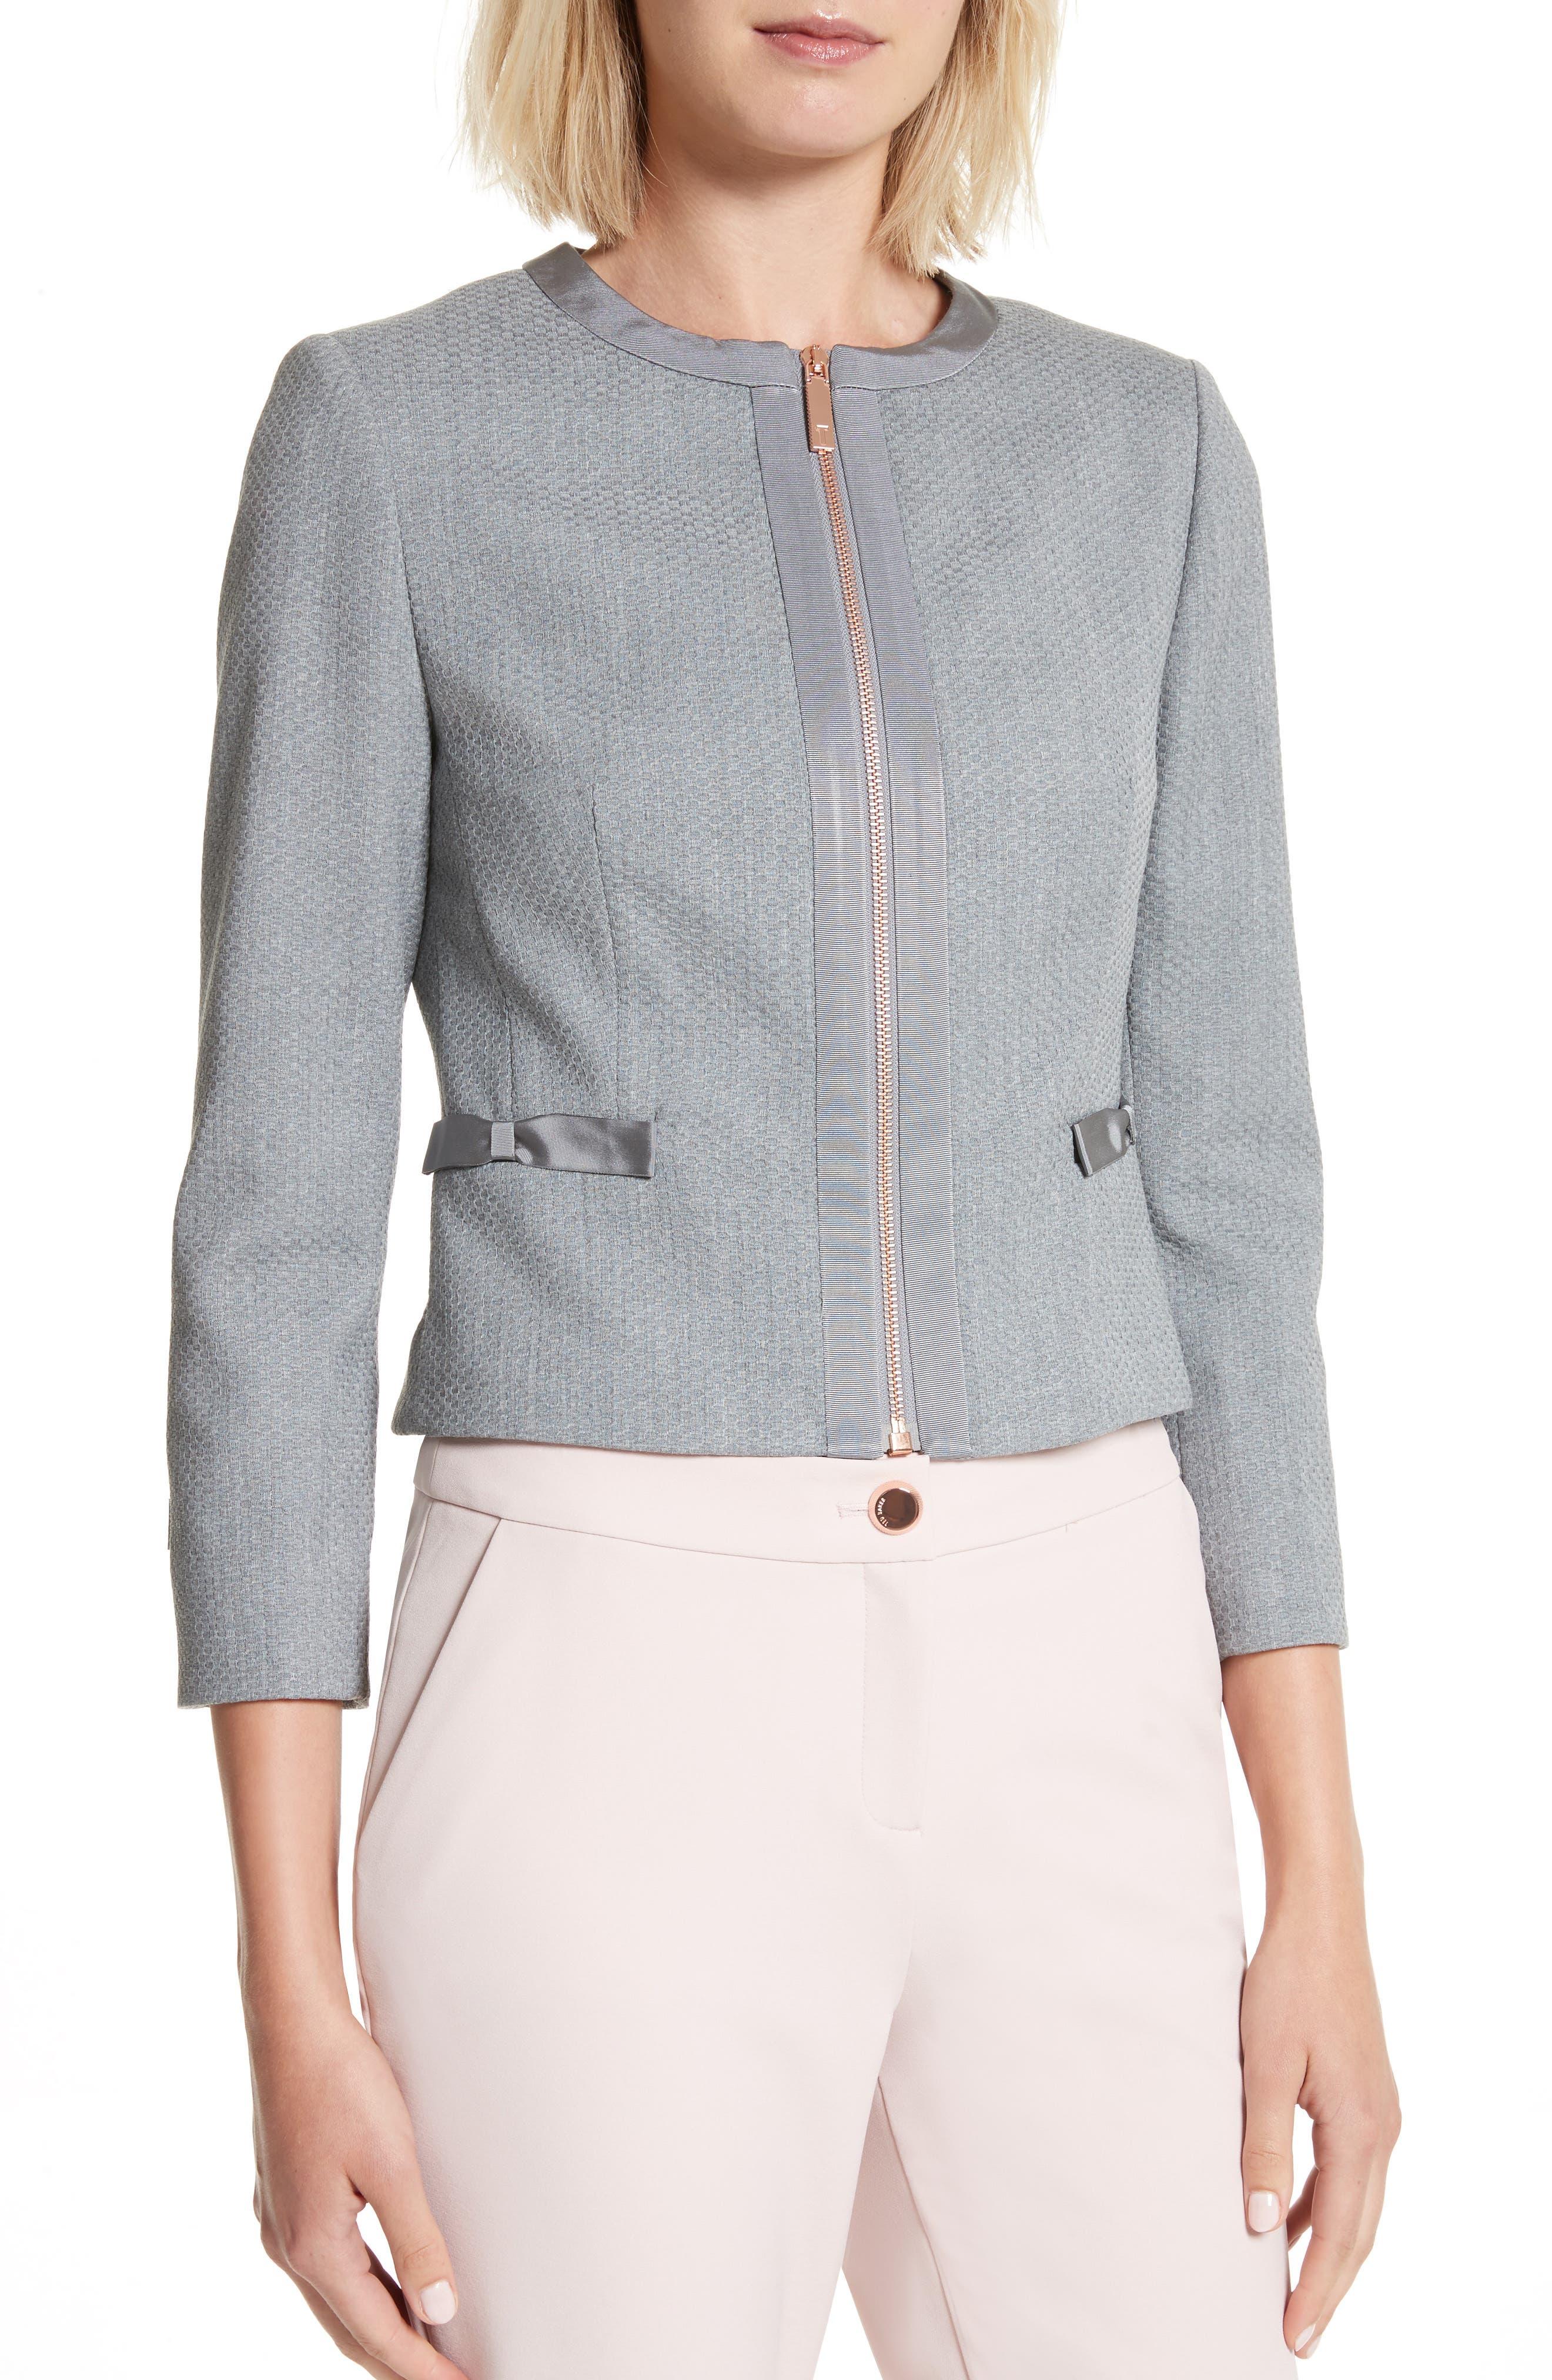 Nadae Bow Detail Crop Jacket,                             Alternate thumbnail 4, color,                             Mid Grey